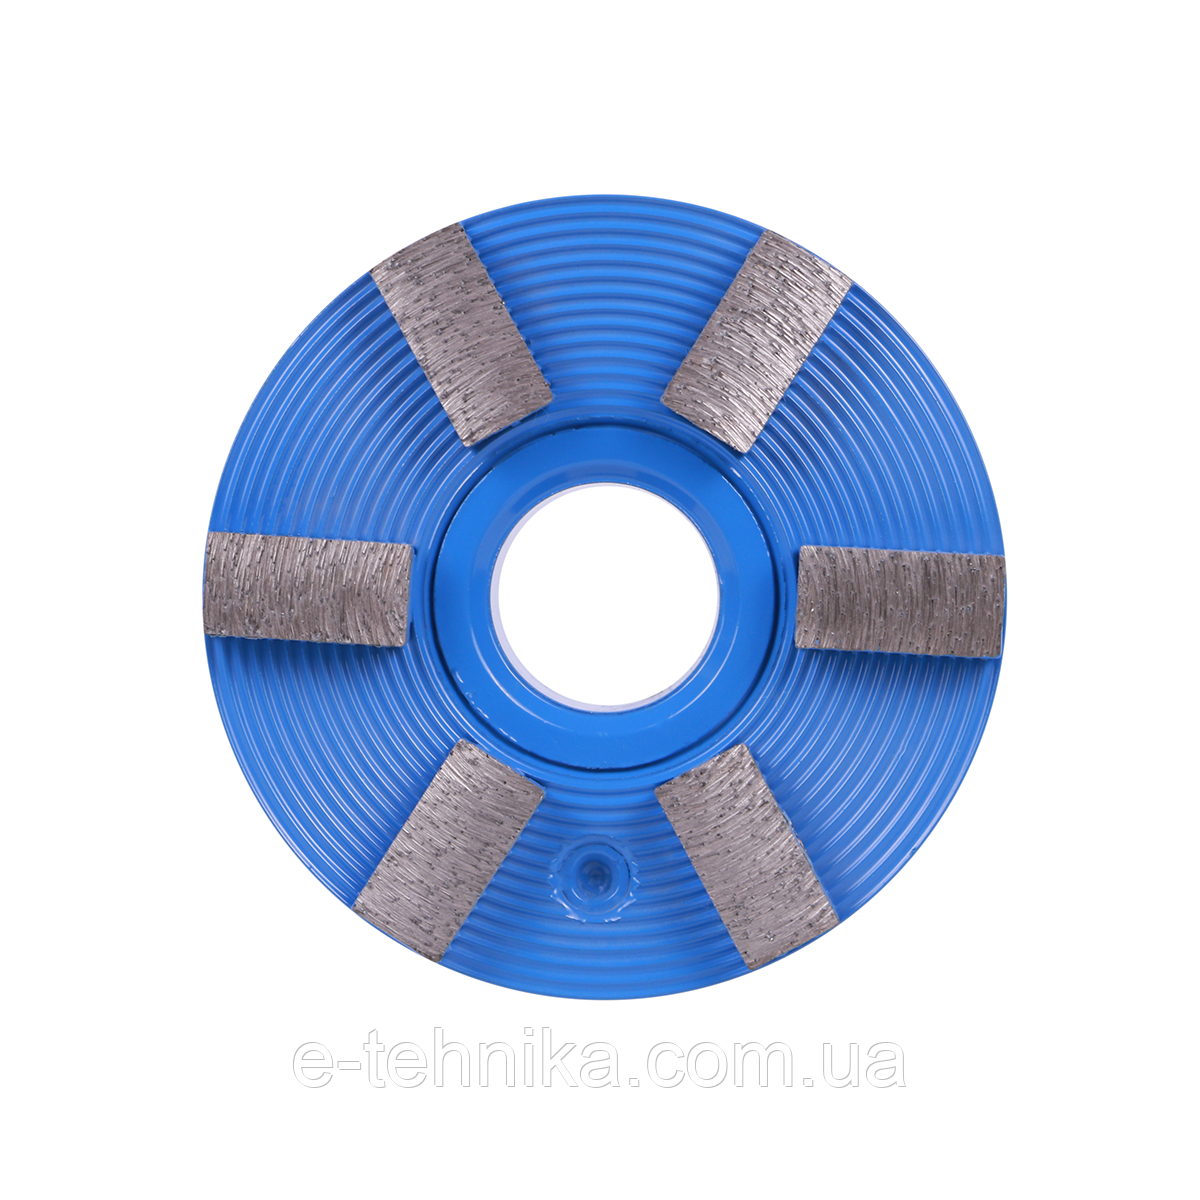 Фреза алмазная GS-W 95/МШМ-6 №0/40 Vortex